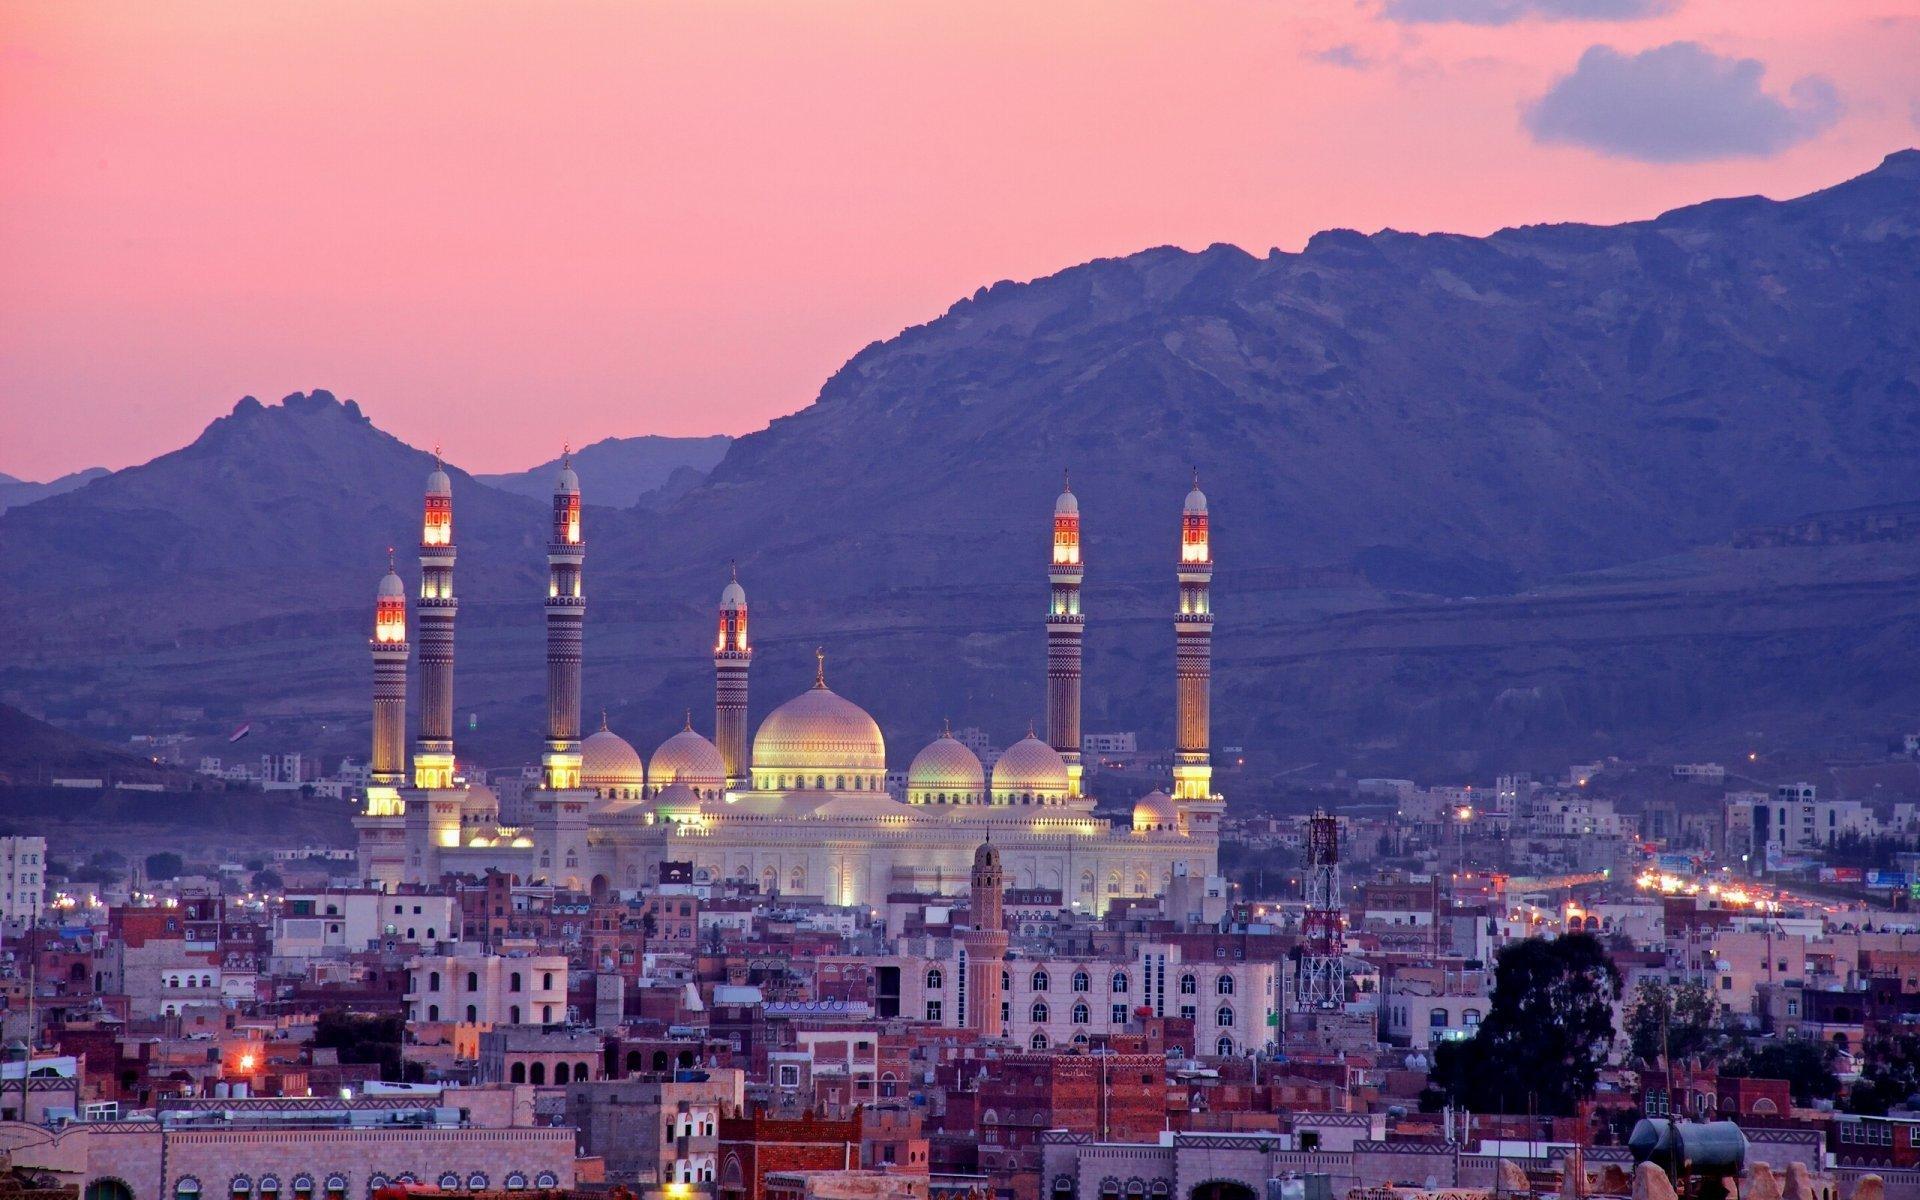 Al Saleh Mosque Backgrounds on Wallpapers Vista